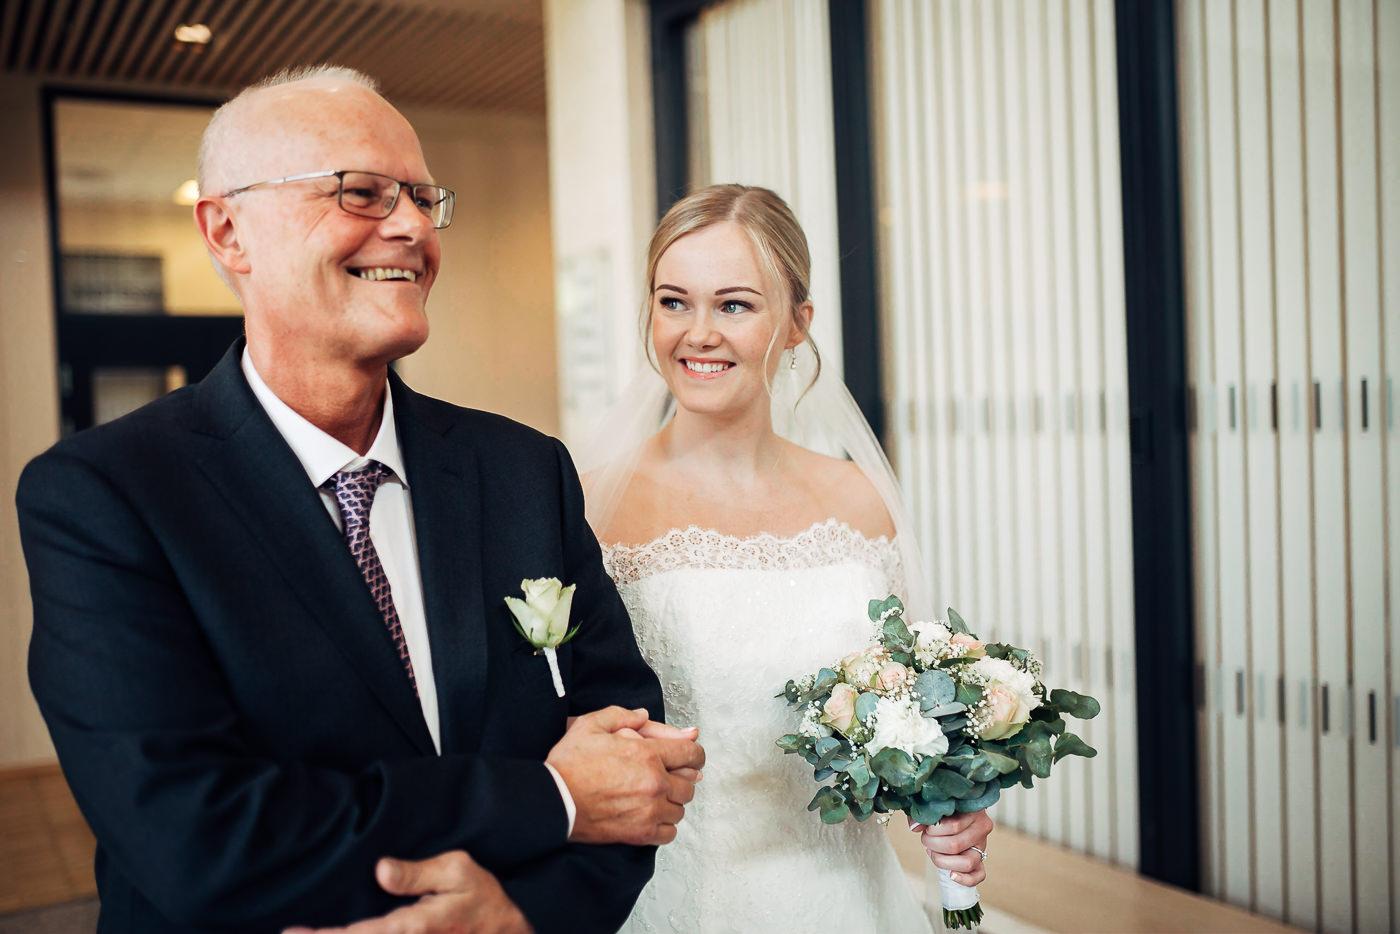 Ida Nathalie & Sebastian  - vakkert junibryllup i Lillestrøm Bryllupsfotograf Hellerud Akershus 29